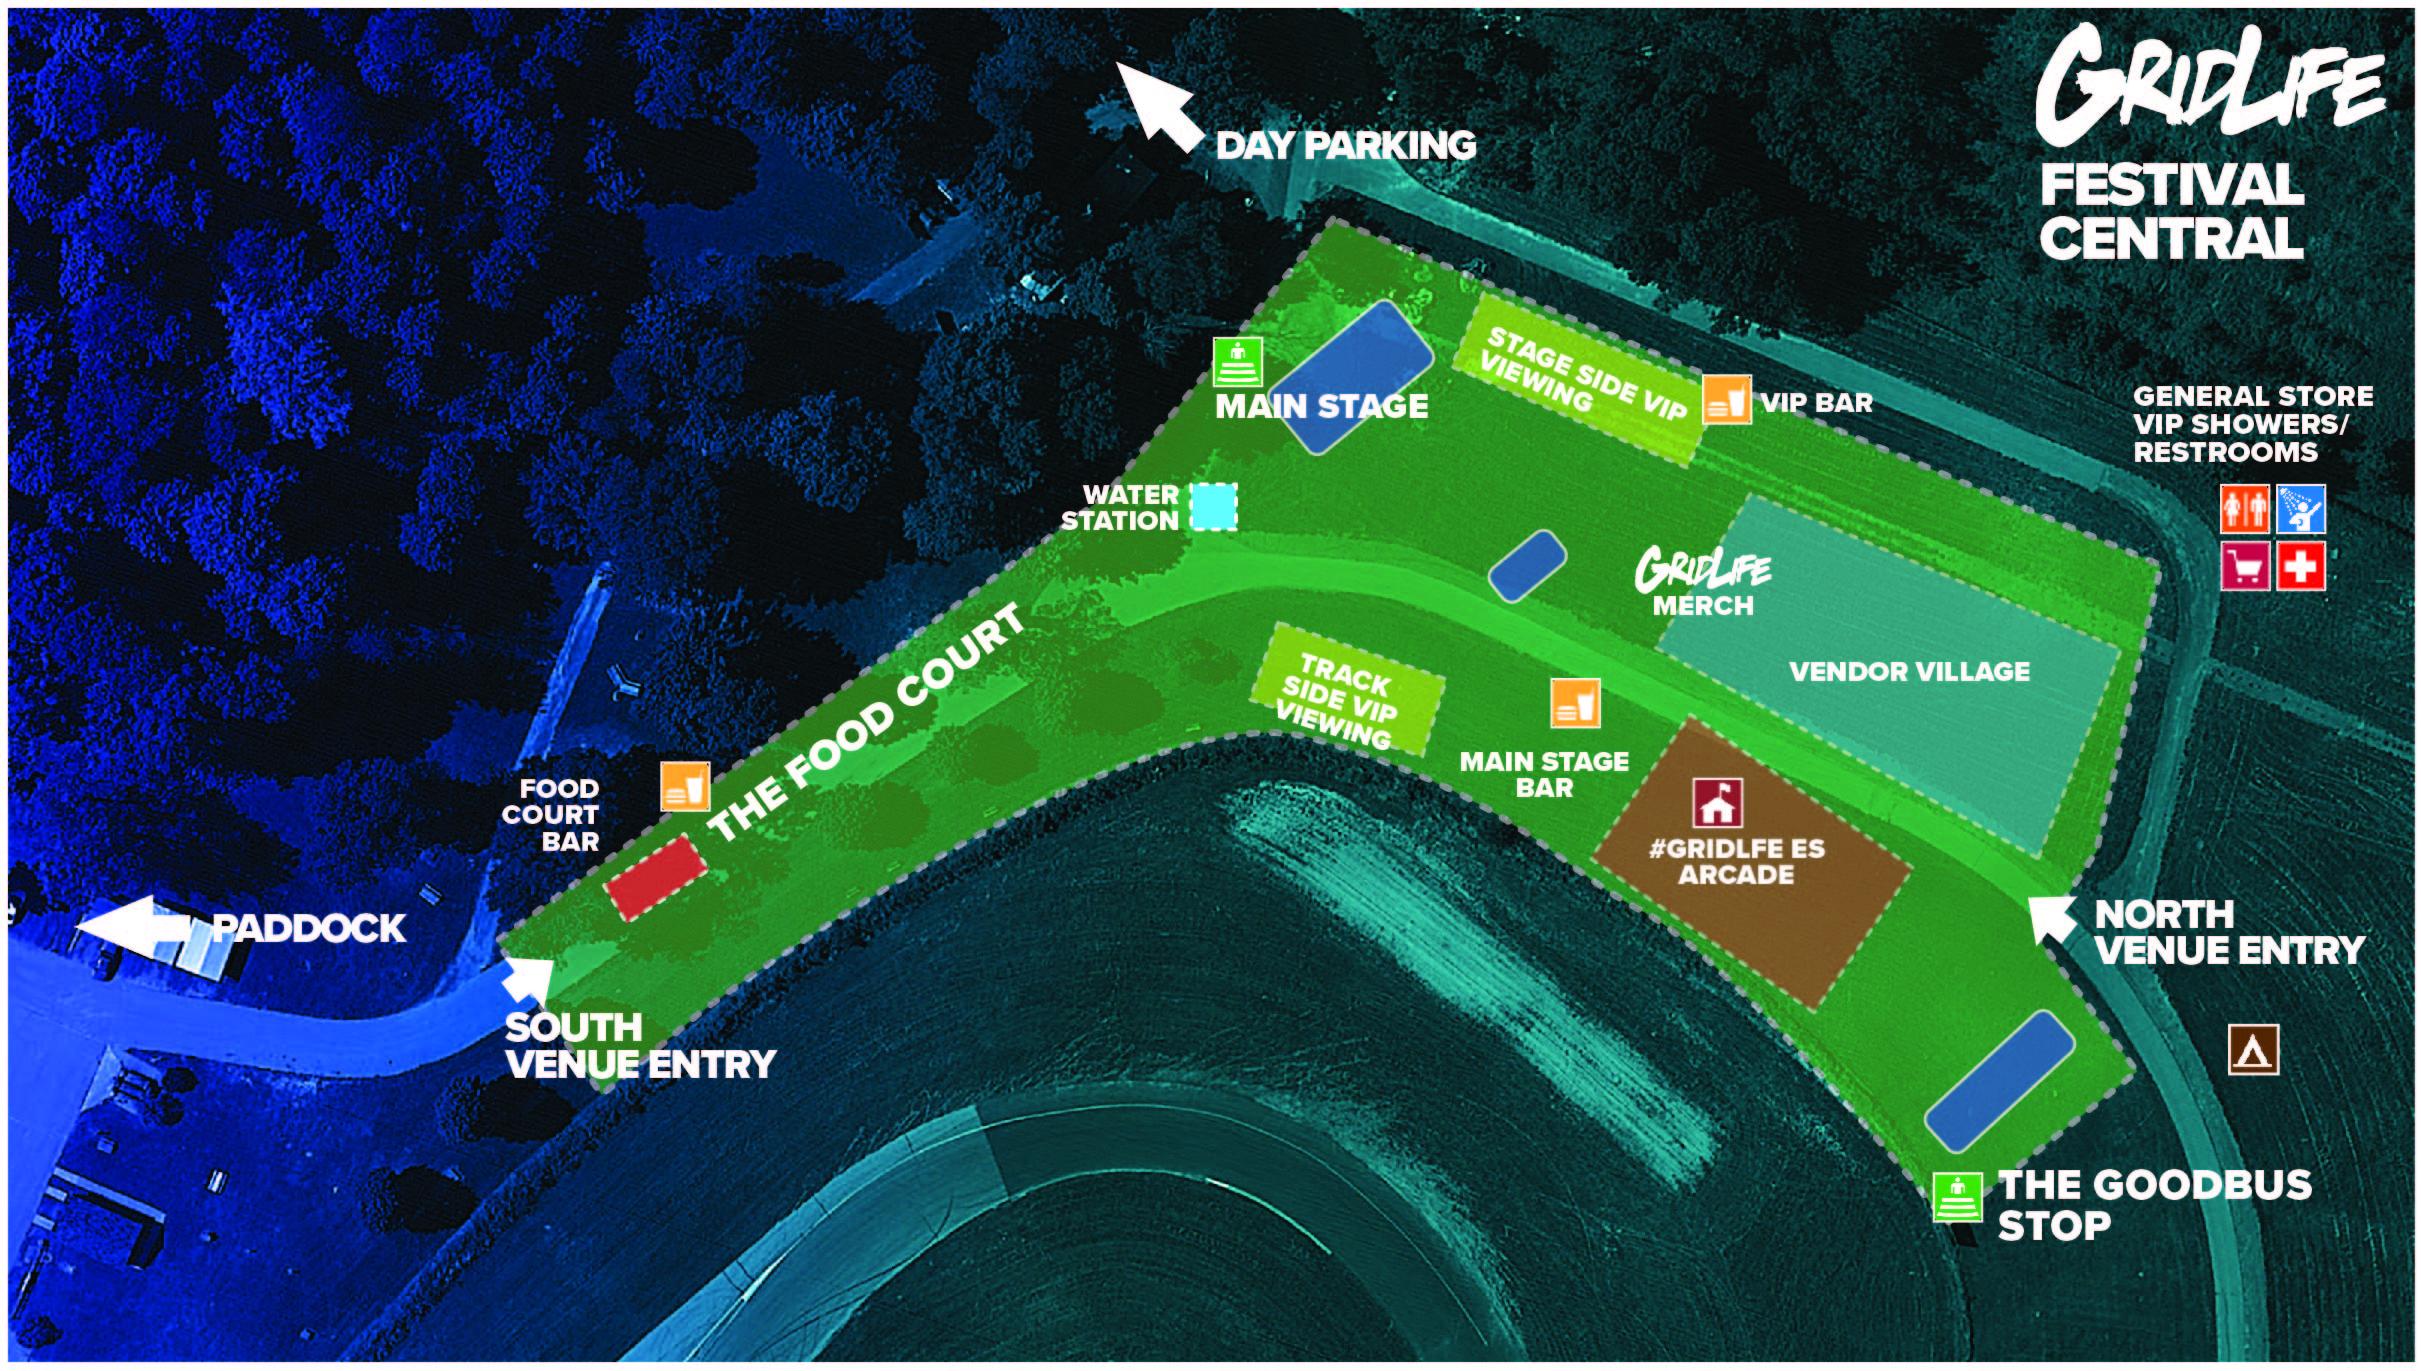 FESTIVAL CENTRAL MAP